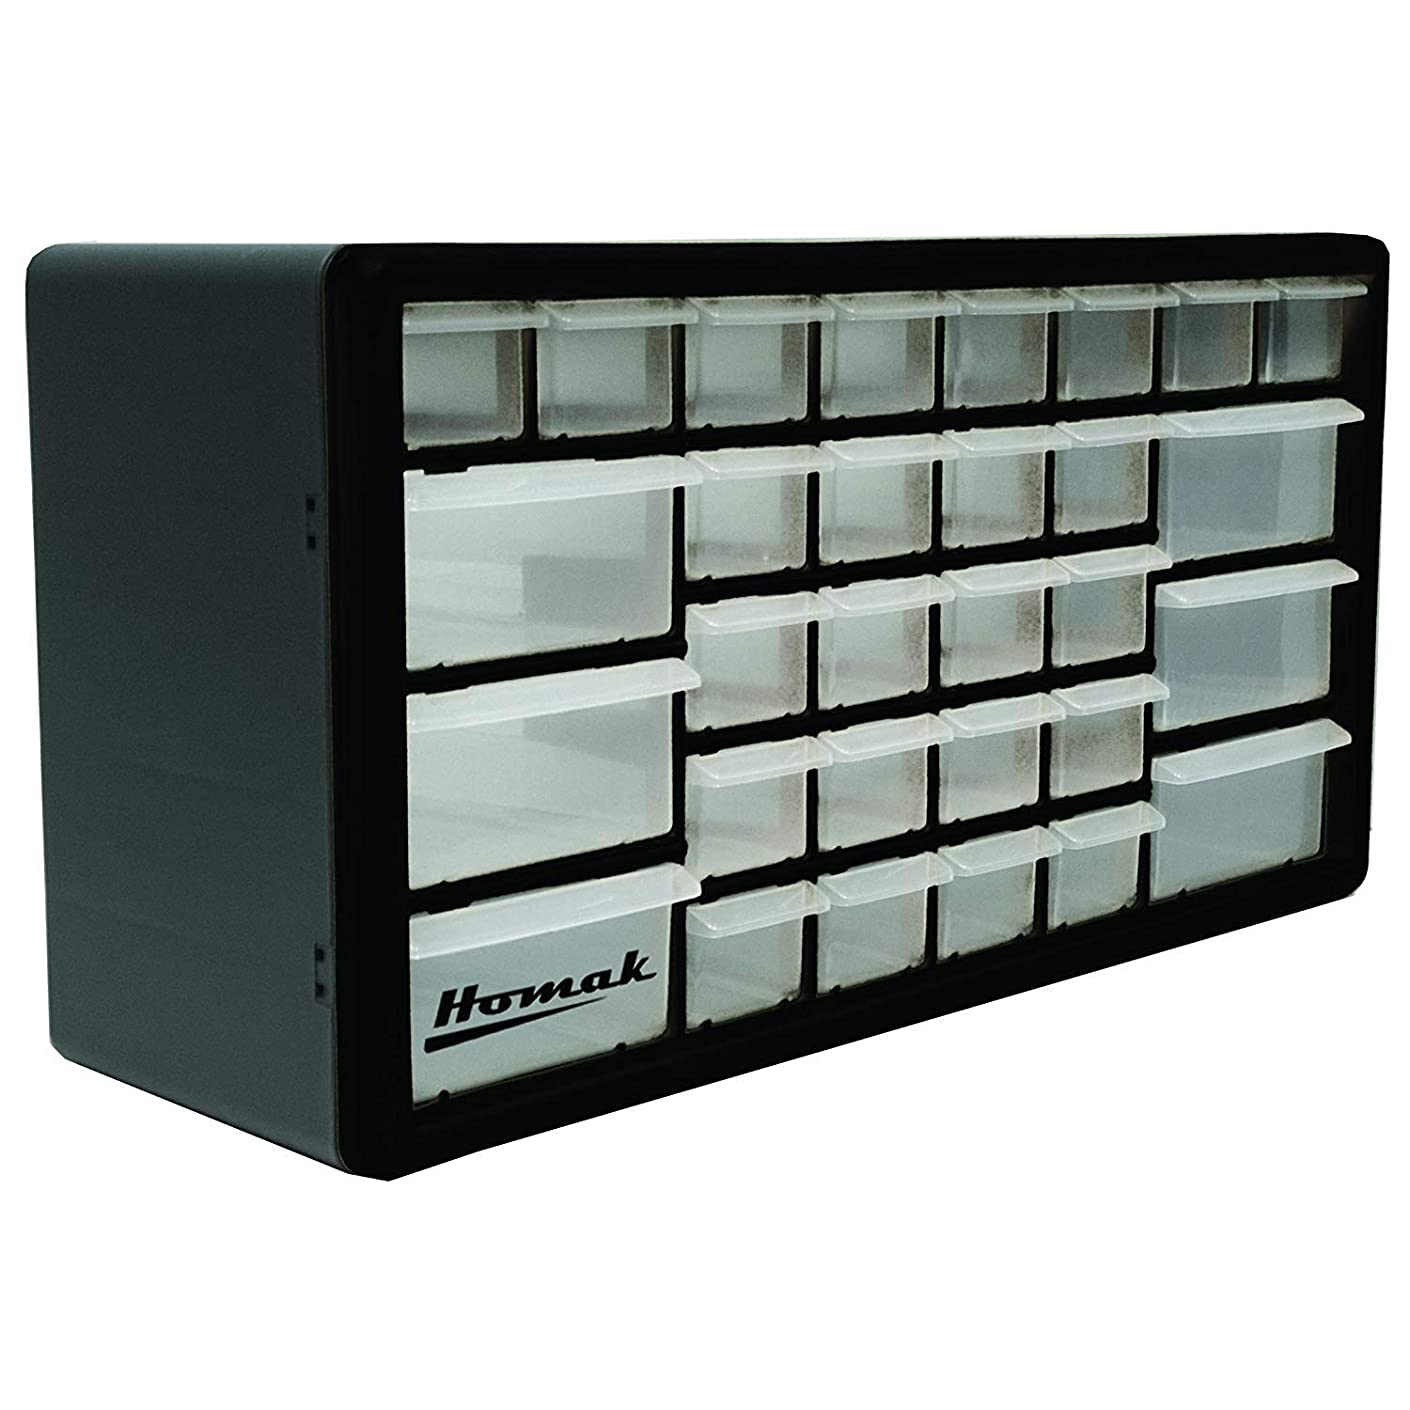 Homak 30-Drawer Parts Organizer, Black, HA01030102